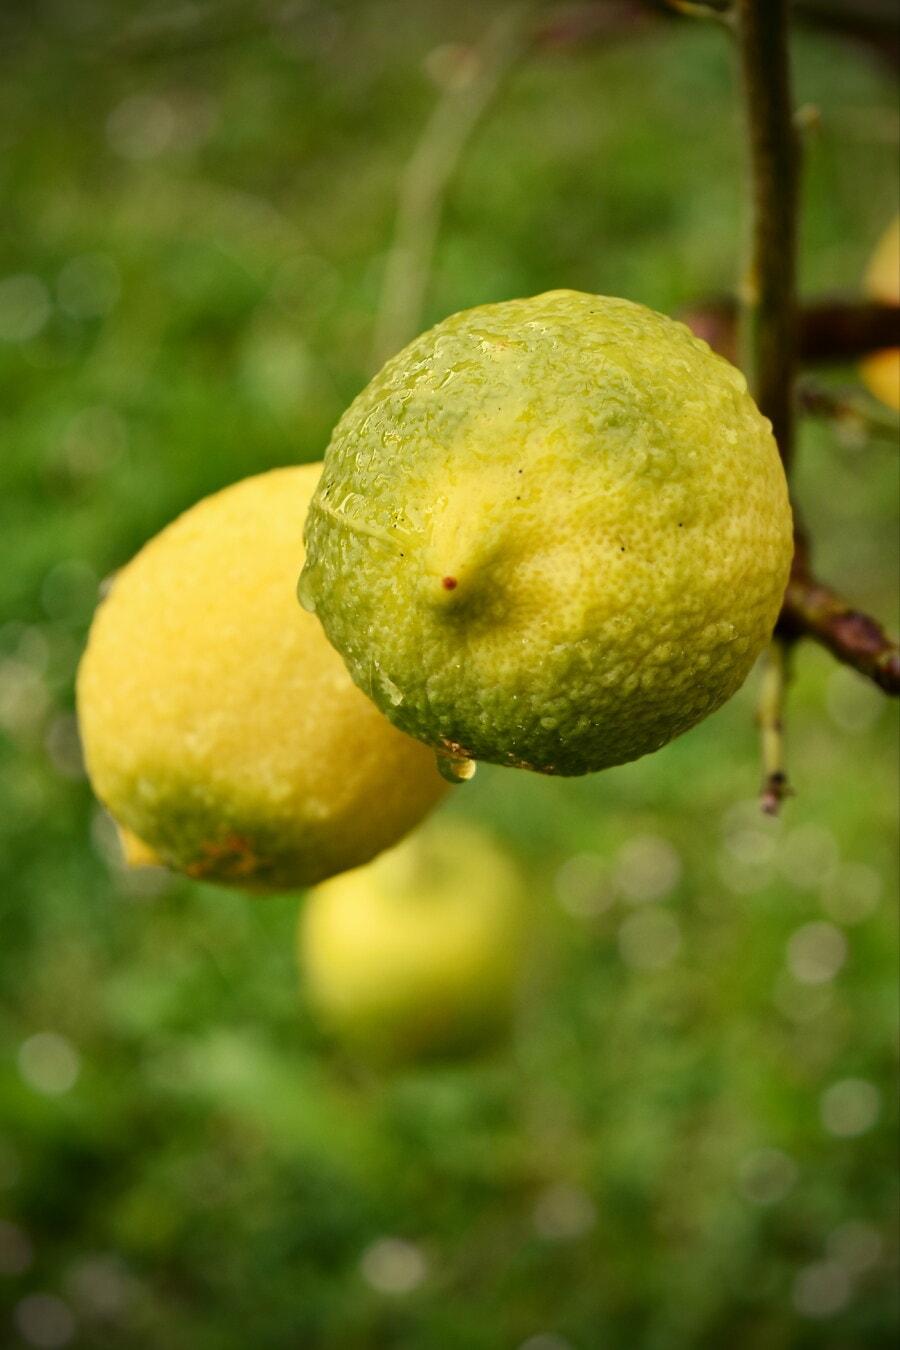 citrus, moisture, lemon, fruit, lime, raindrop, fruit tree, orchard, organic, fresh